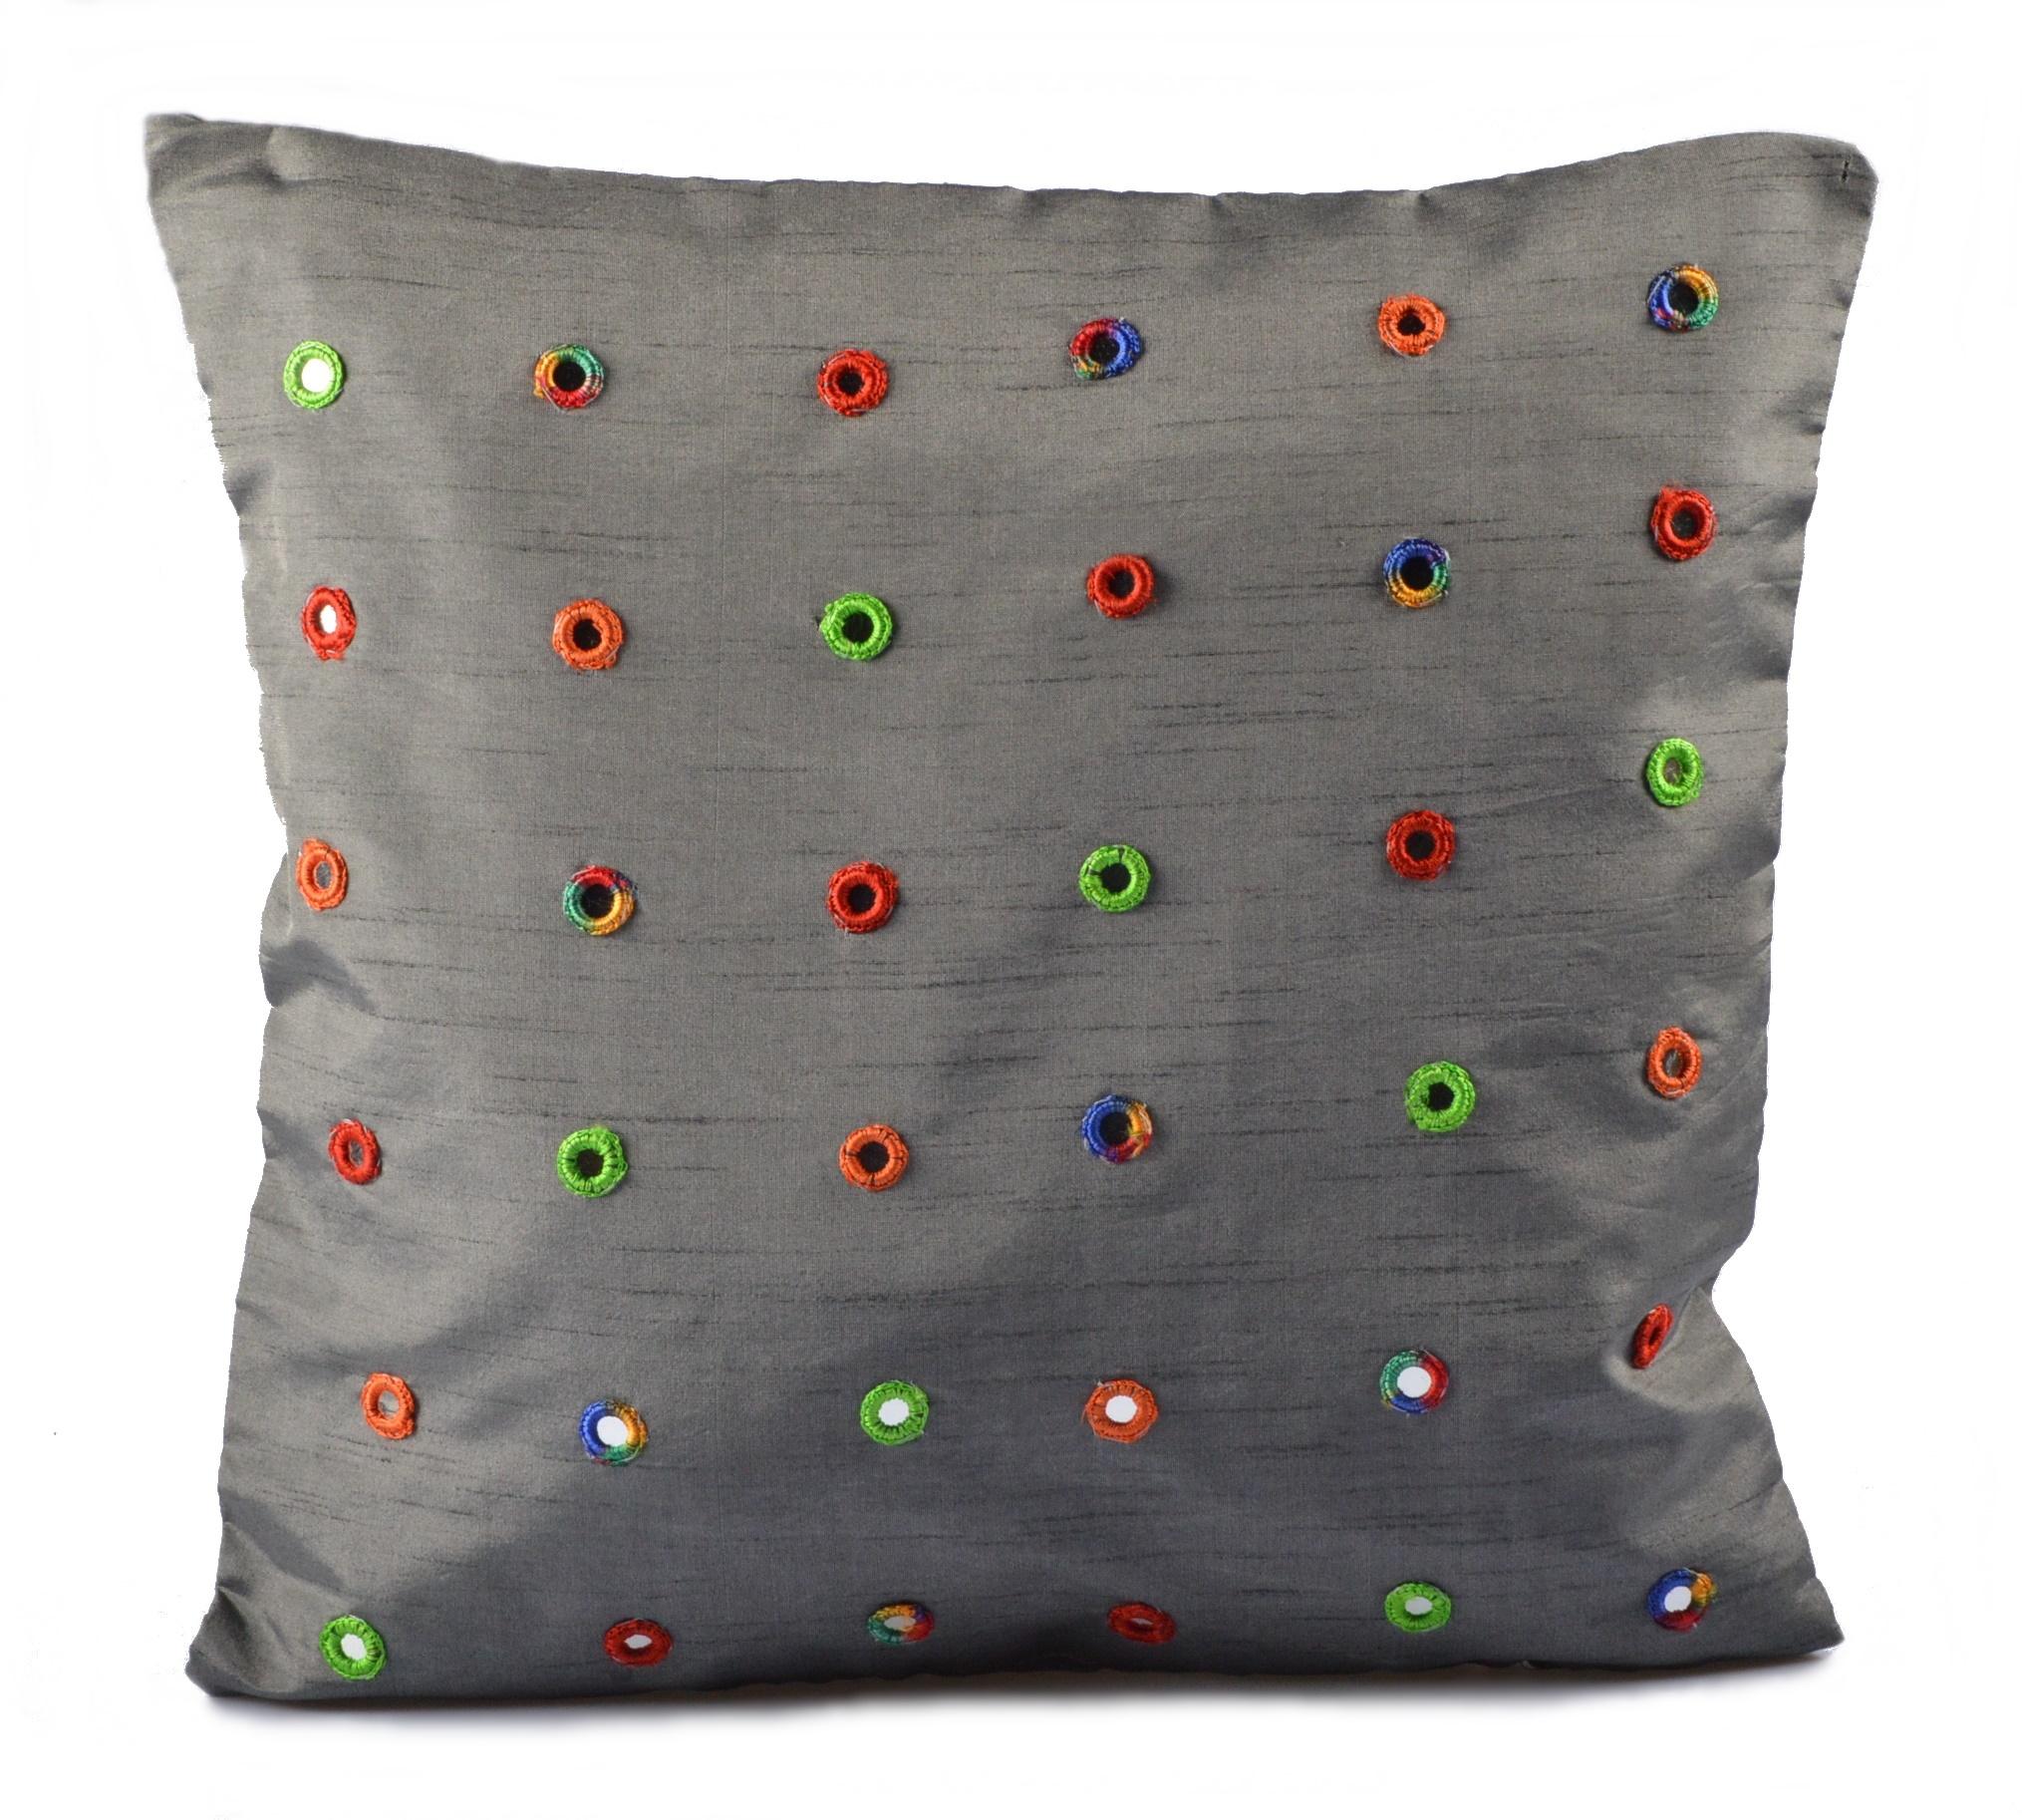 kissenh lle kissenbezug dekokissen kissen deko bezug bunt sofakissen h lle 45x45 ebay. Black Bedroom Furniture Sets. Home Design Ideas